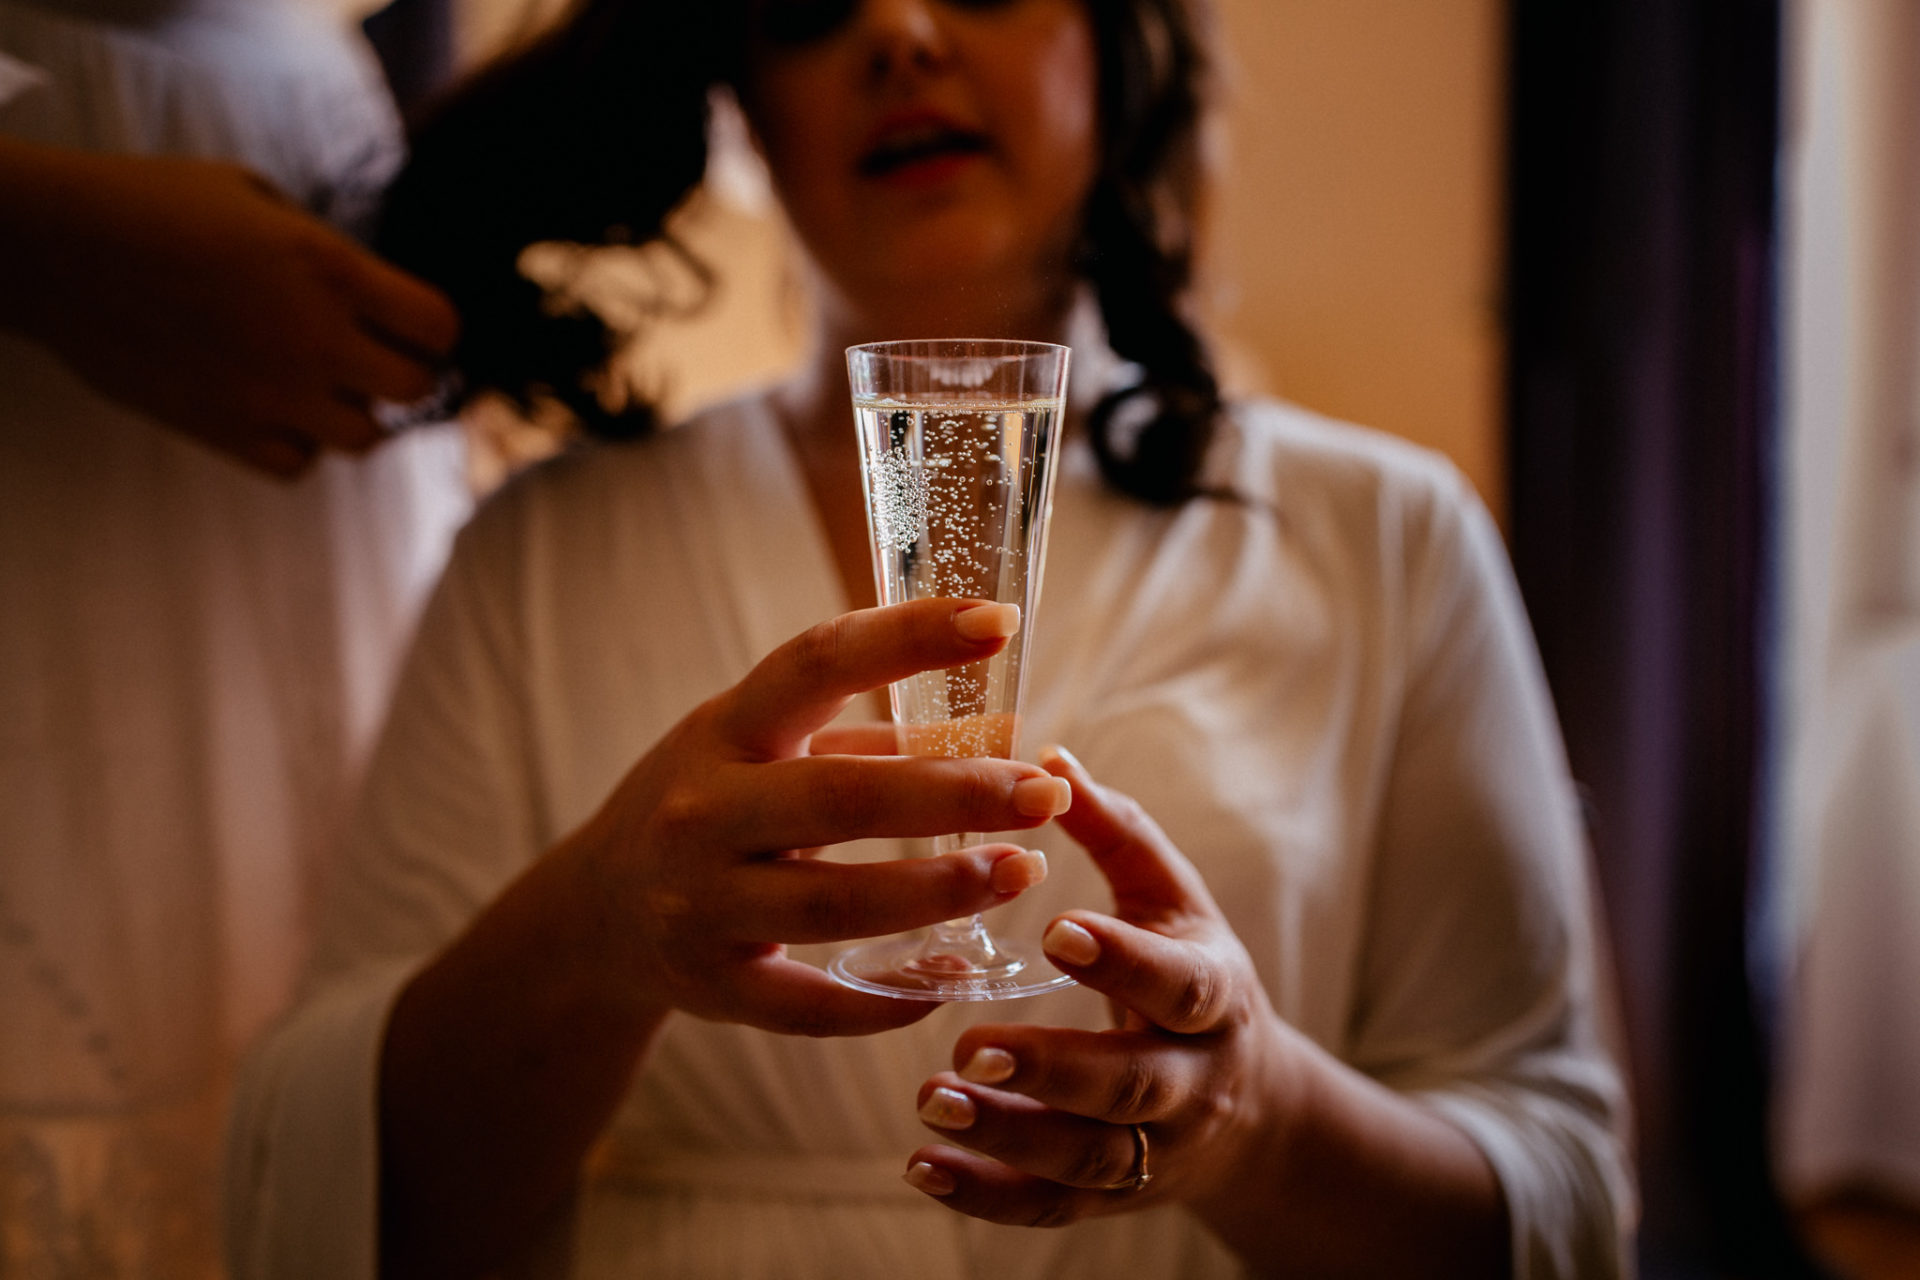 hochzeitsfotograf schloss heinsheim-elegant heiraten-Schafstall Heinsheim-getting ready braut-sekt trinken